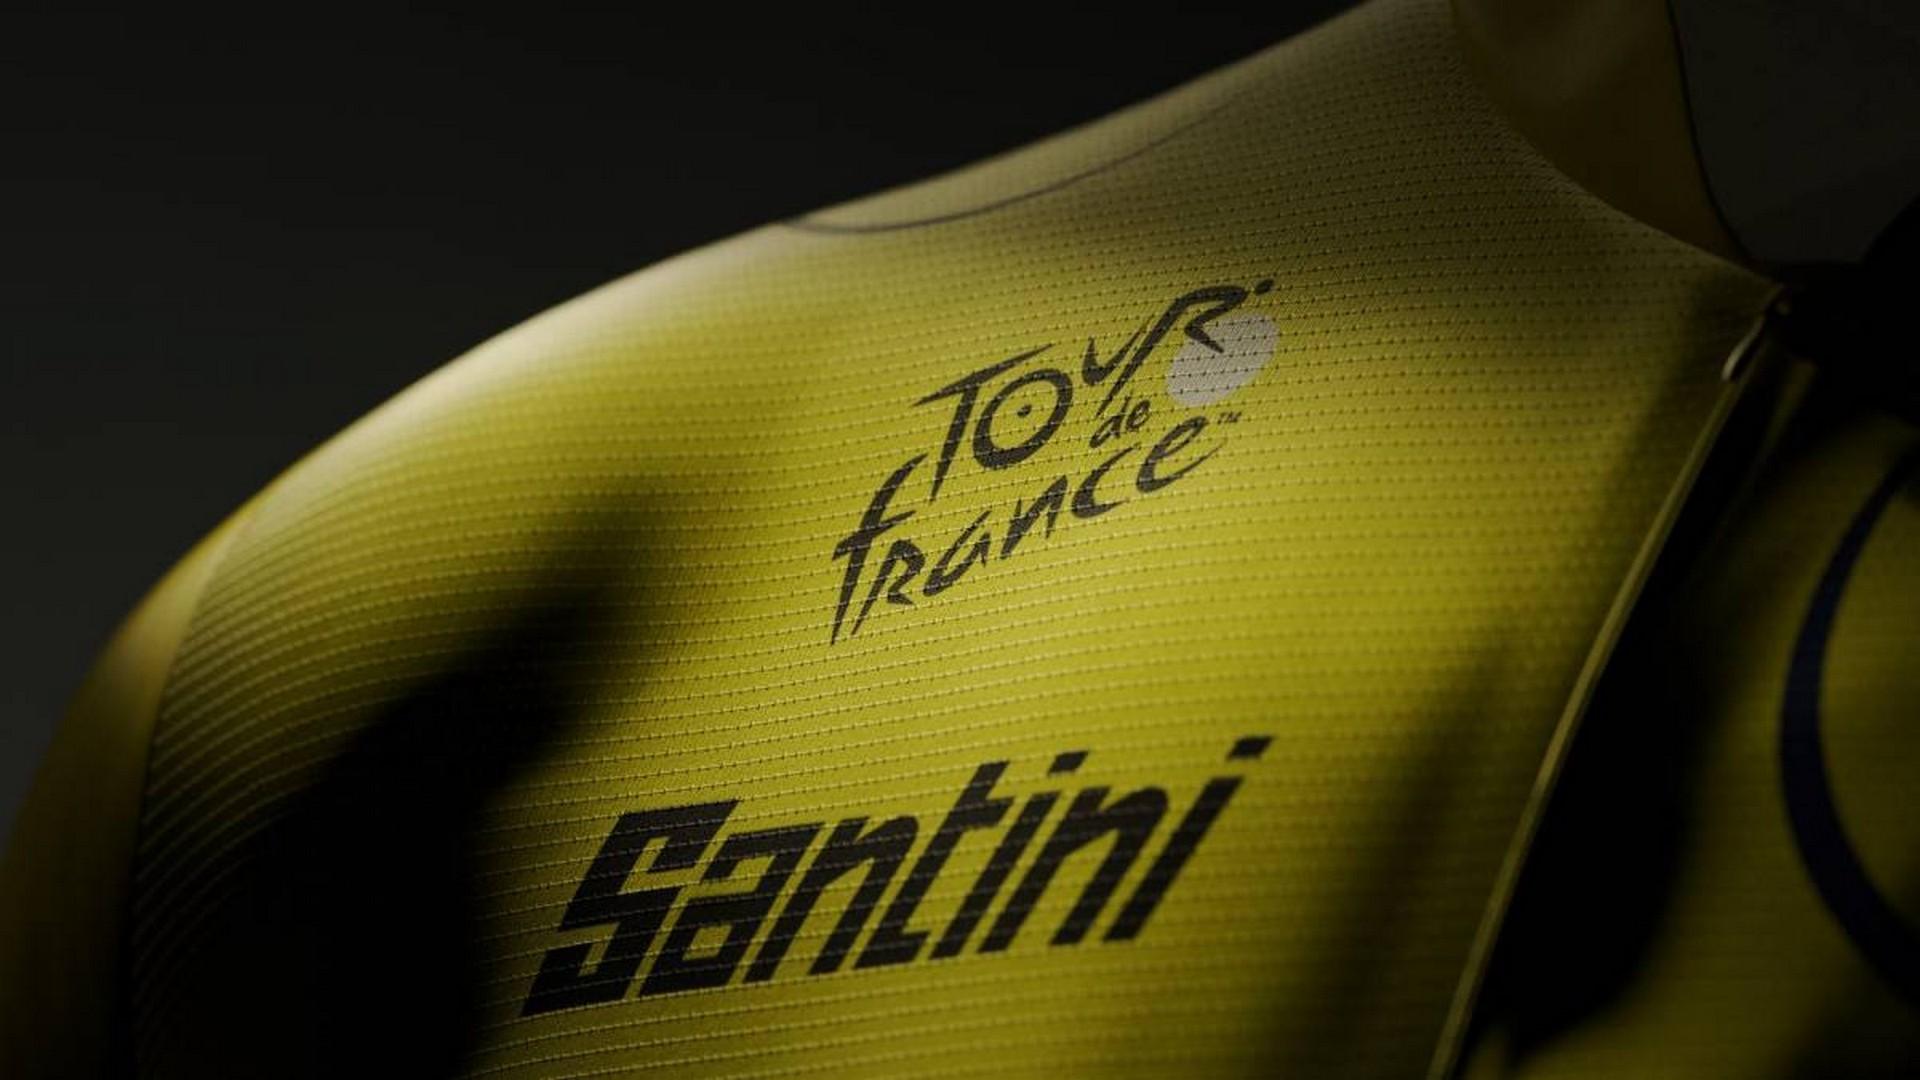 Santini x Tour de France (cyclisme) 2021